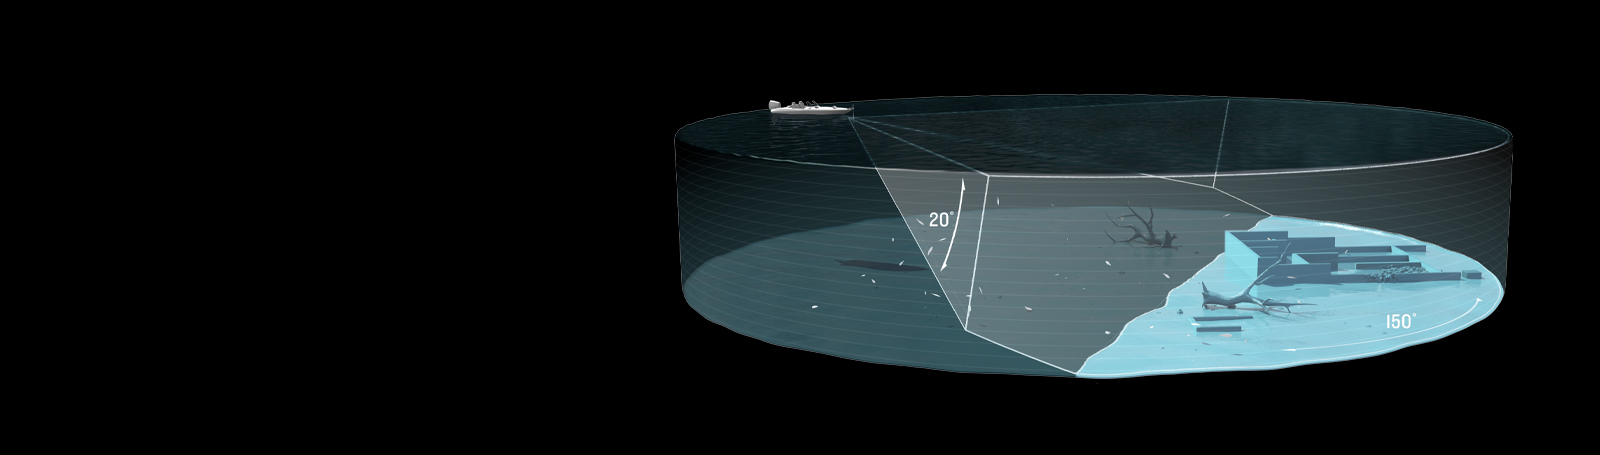 Garmin Perspective Mode Mount for Panoptix Livescope - 28105 D 1 b636de1e aece 4027 9afa 4620bcb85e1b